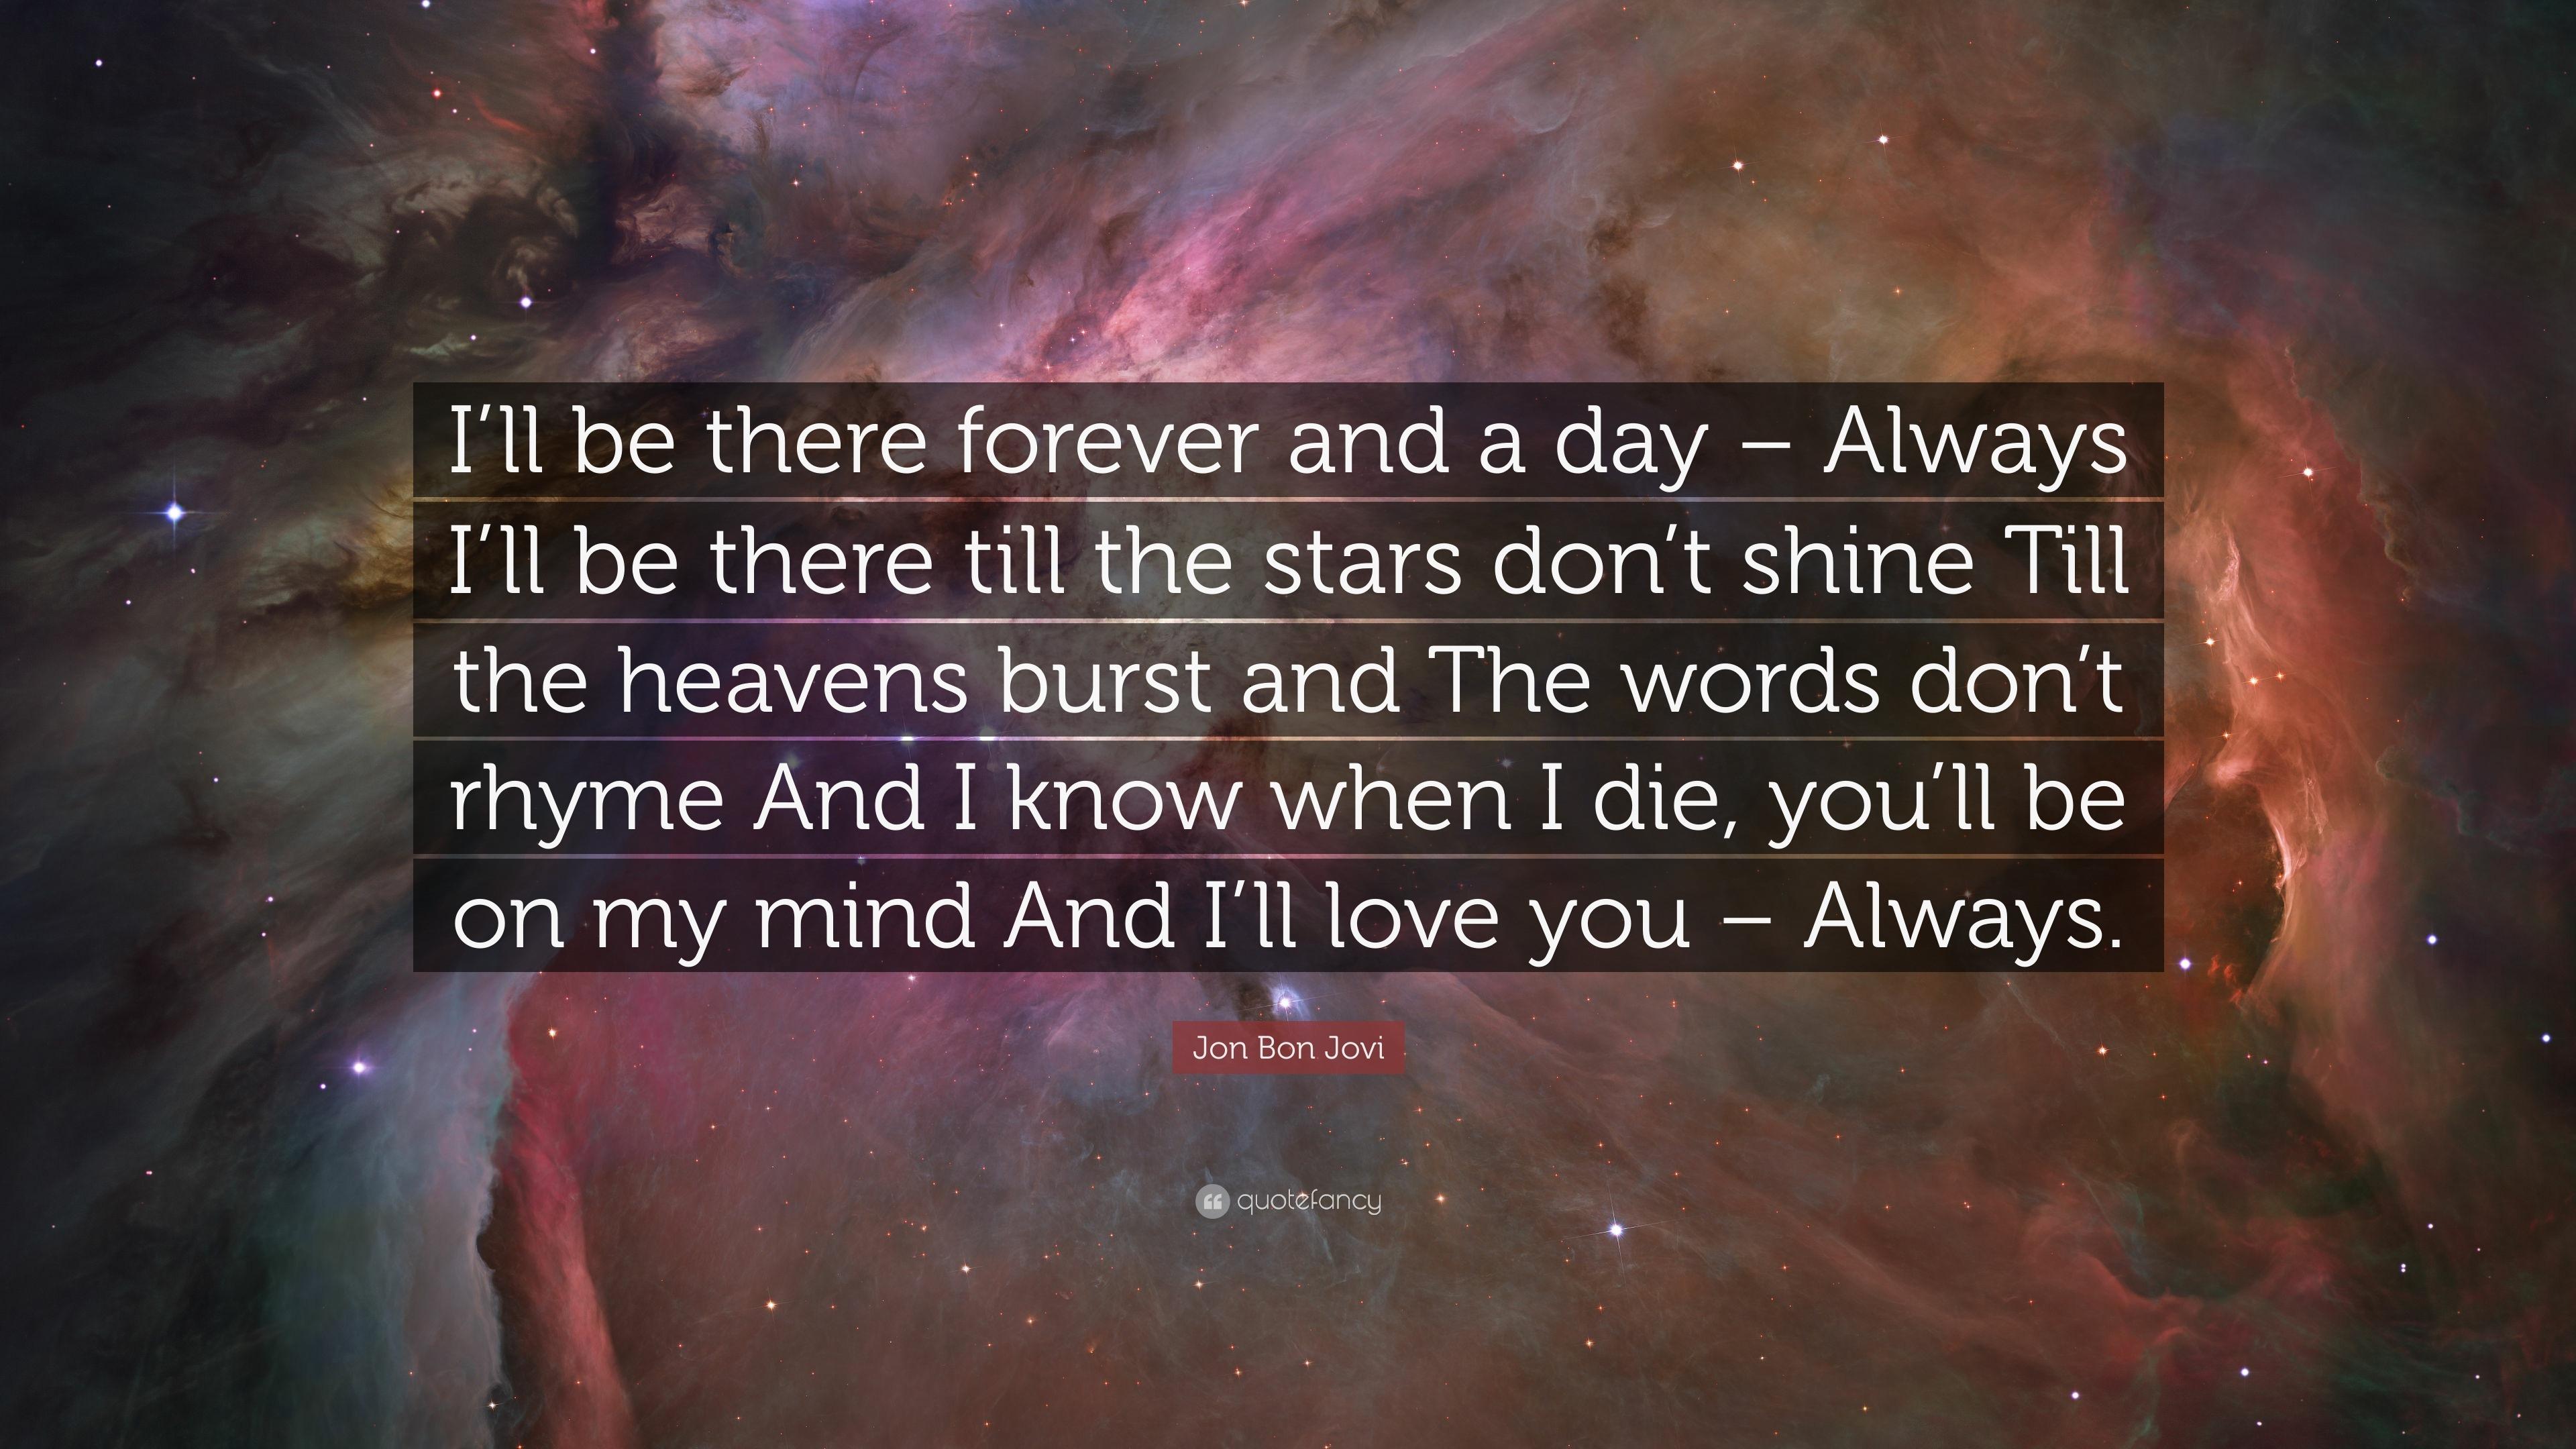 Bon jovi always love you